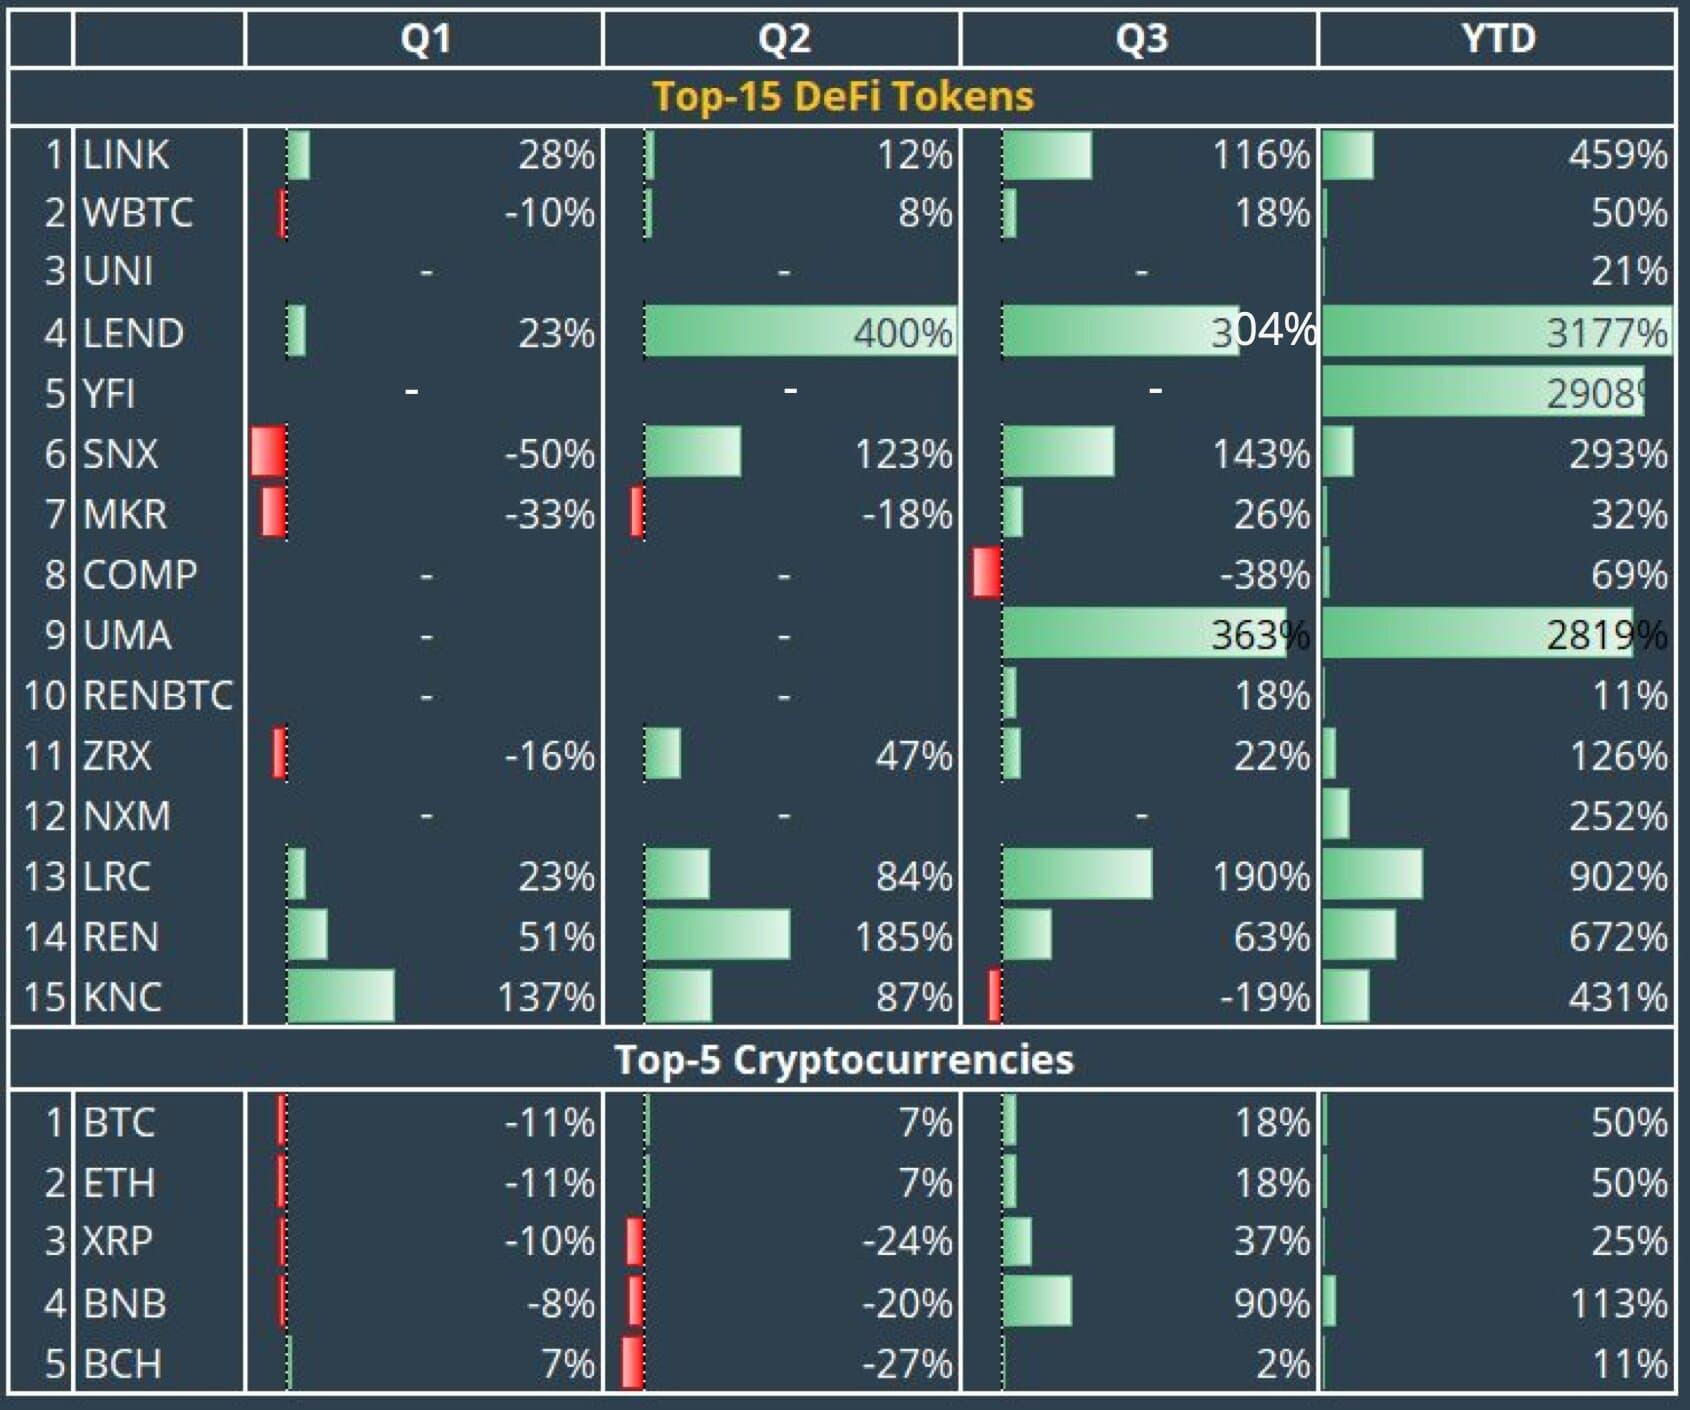 coingecko-q3-report-kripto